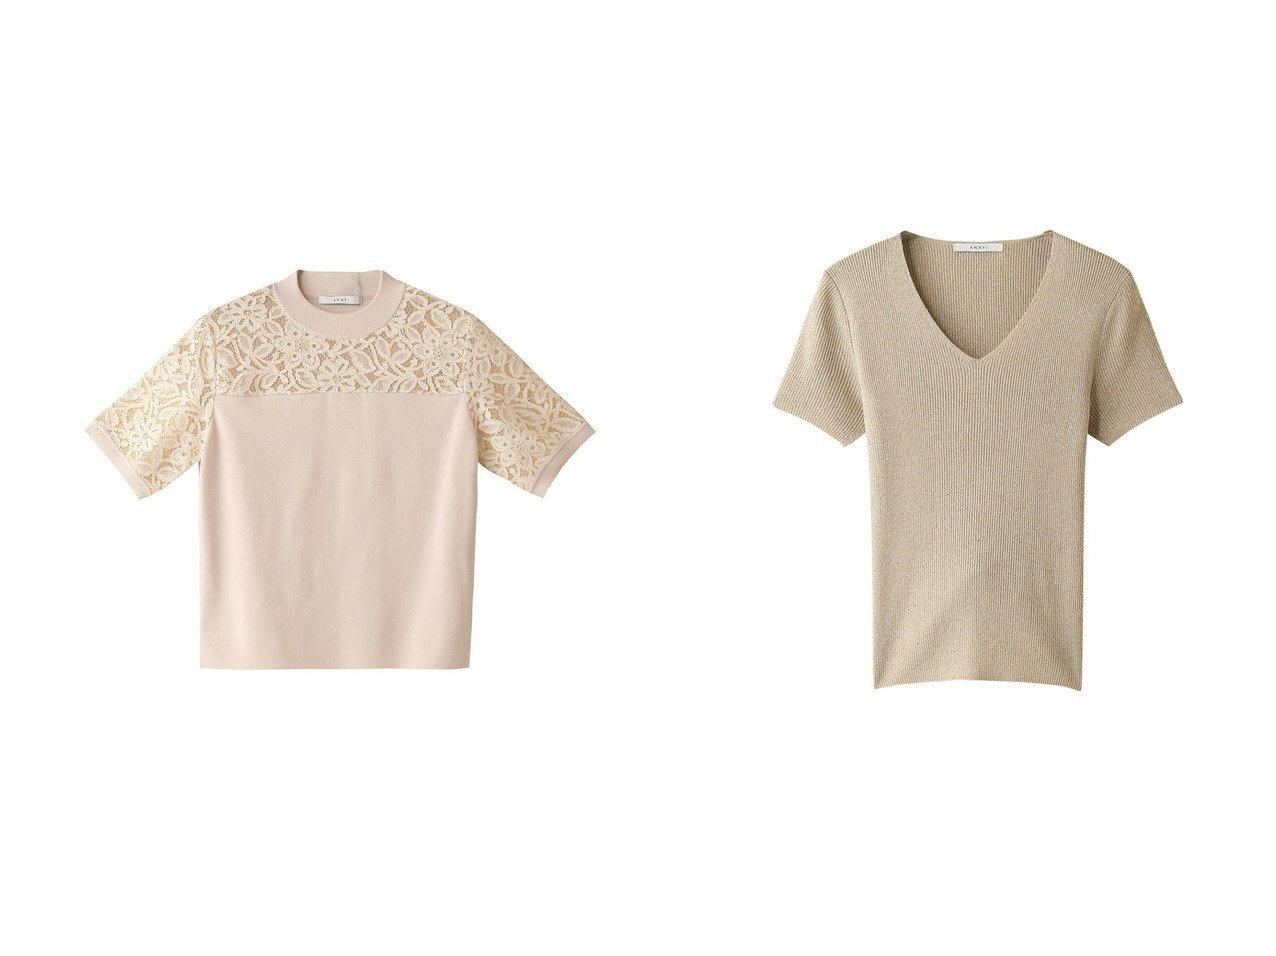 【ANAYI/アナイ】のラメリブVネックプルオーバー&バイカラーレースモックネックプルオーバー トップス・カットソーのおすすめ!人気、トレンド・レディースファッションの通販 おすすめで人気の流行・トレンド、ファッションの通販商品 メンズファッション・キッズファッション・インテリア・家具・レディースファッション・服の通販 founy(ファニー) https://founy.com/ ファッション Fashion レディースファッション WOMEN トップス Tops Tshirt ニット Knit Tops プルオーバー Pullover Vネック V-Neck クラシカル スリーブ トレンド フォルム ボトム レース コンパクト スマート デコルテ |ID:crp329100000013113